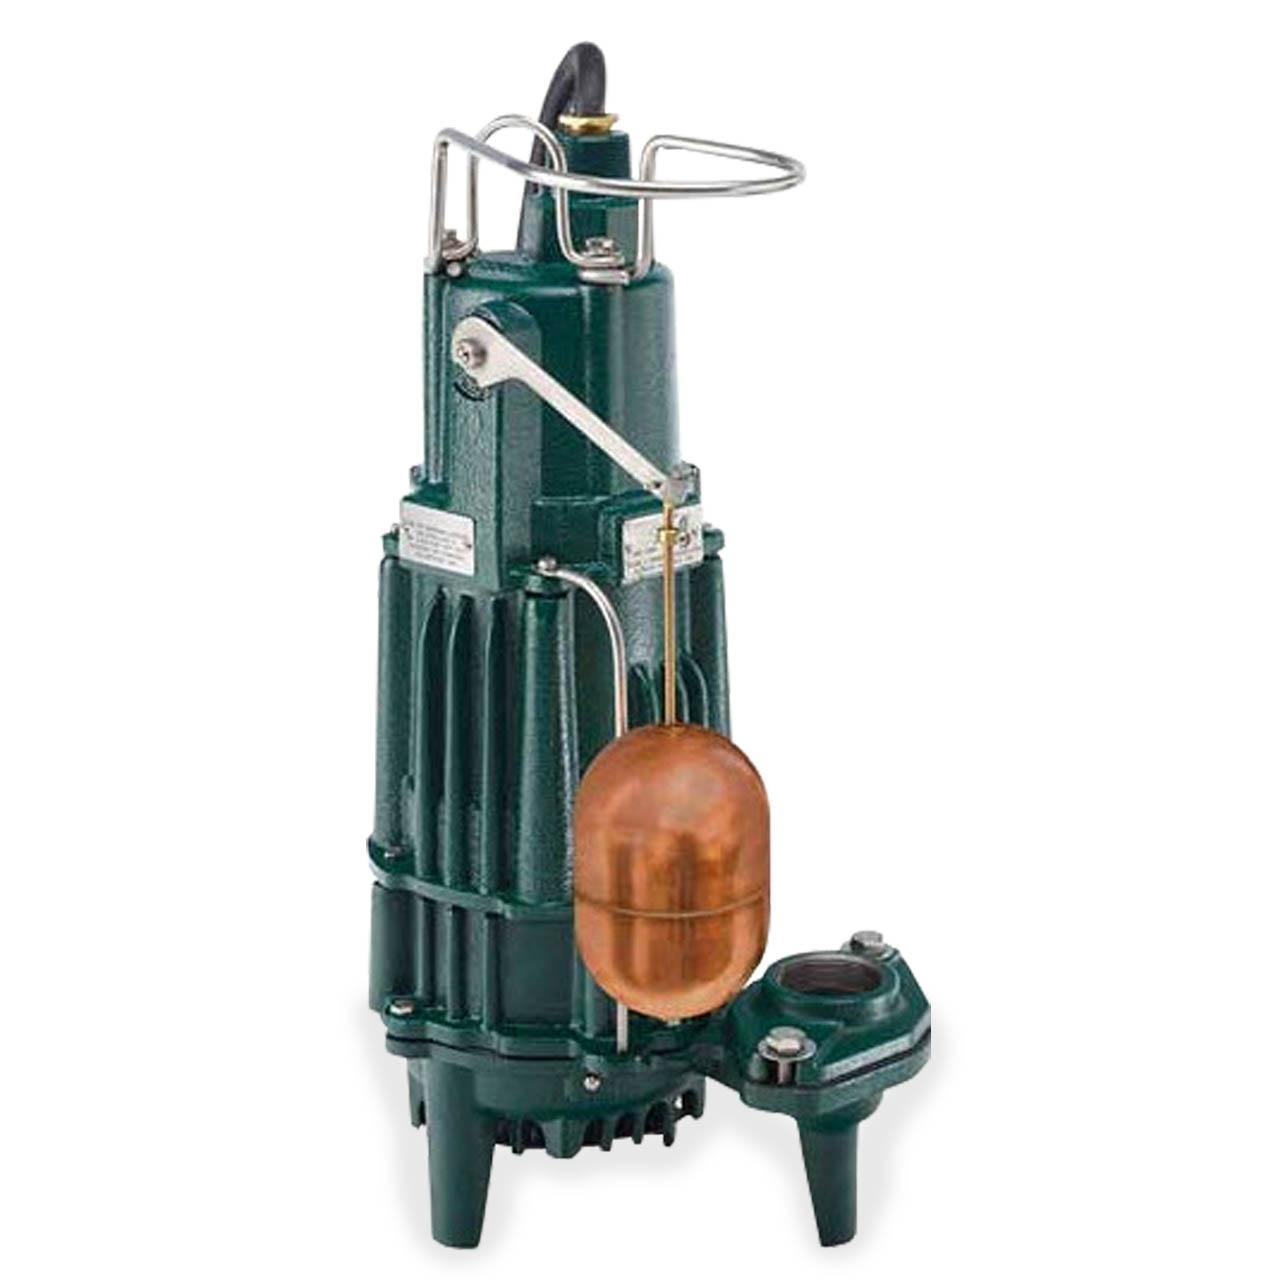 Zoeller - Zoeller 161-0071 Model MX161 Explosion Proof High Head Effluent  Pump 0.5 HP 115V 1PH 20' Cord Automatic #ZLR161-0071